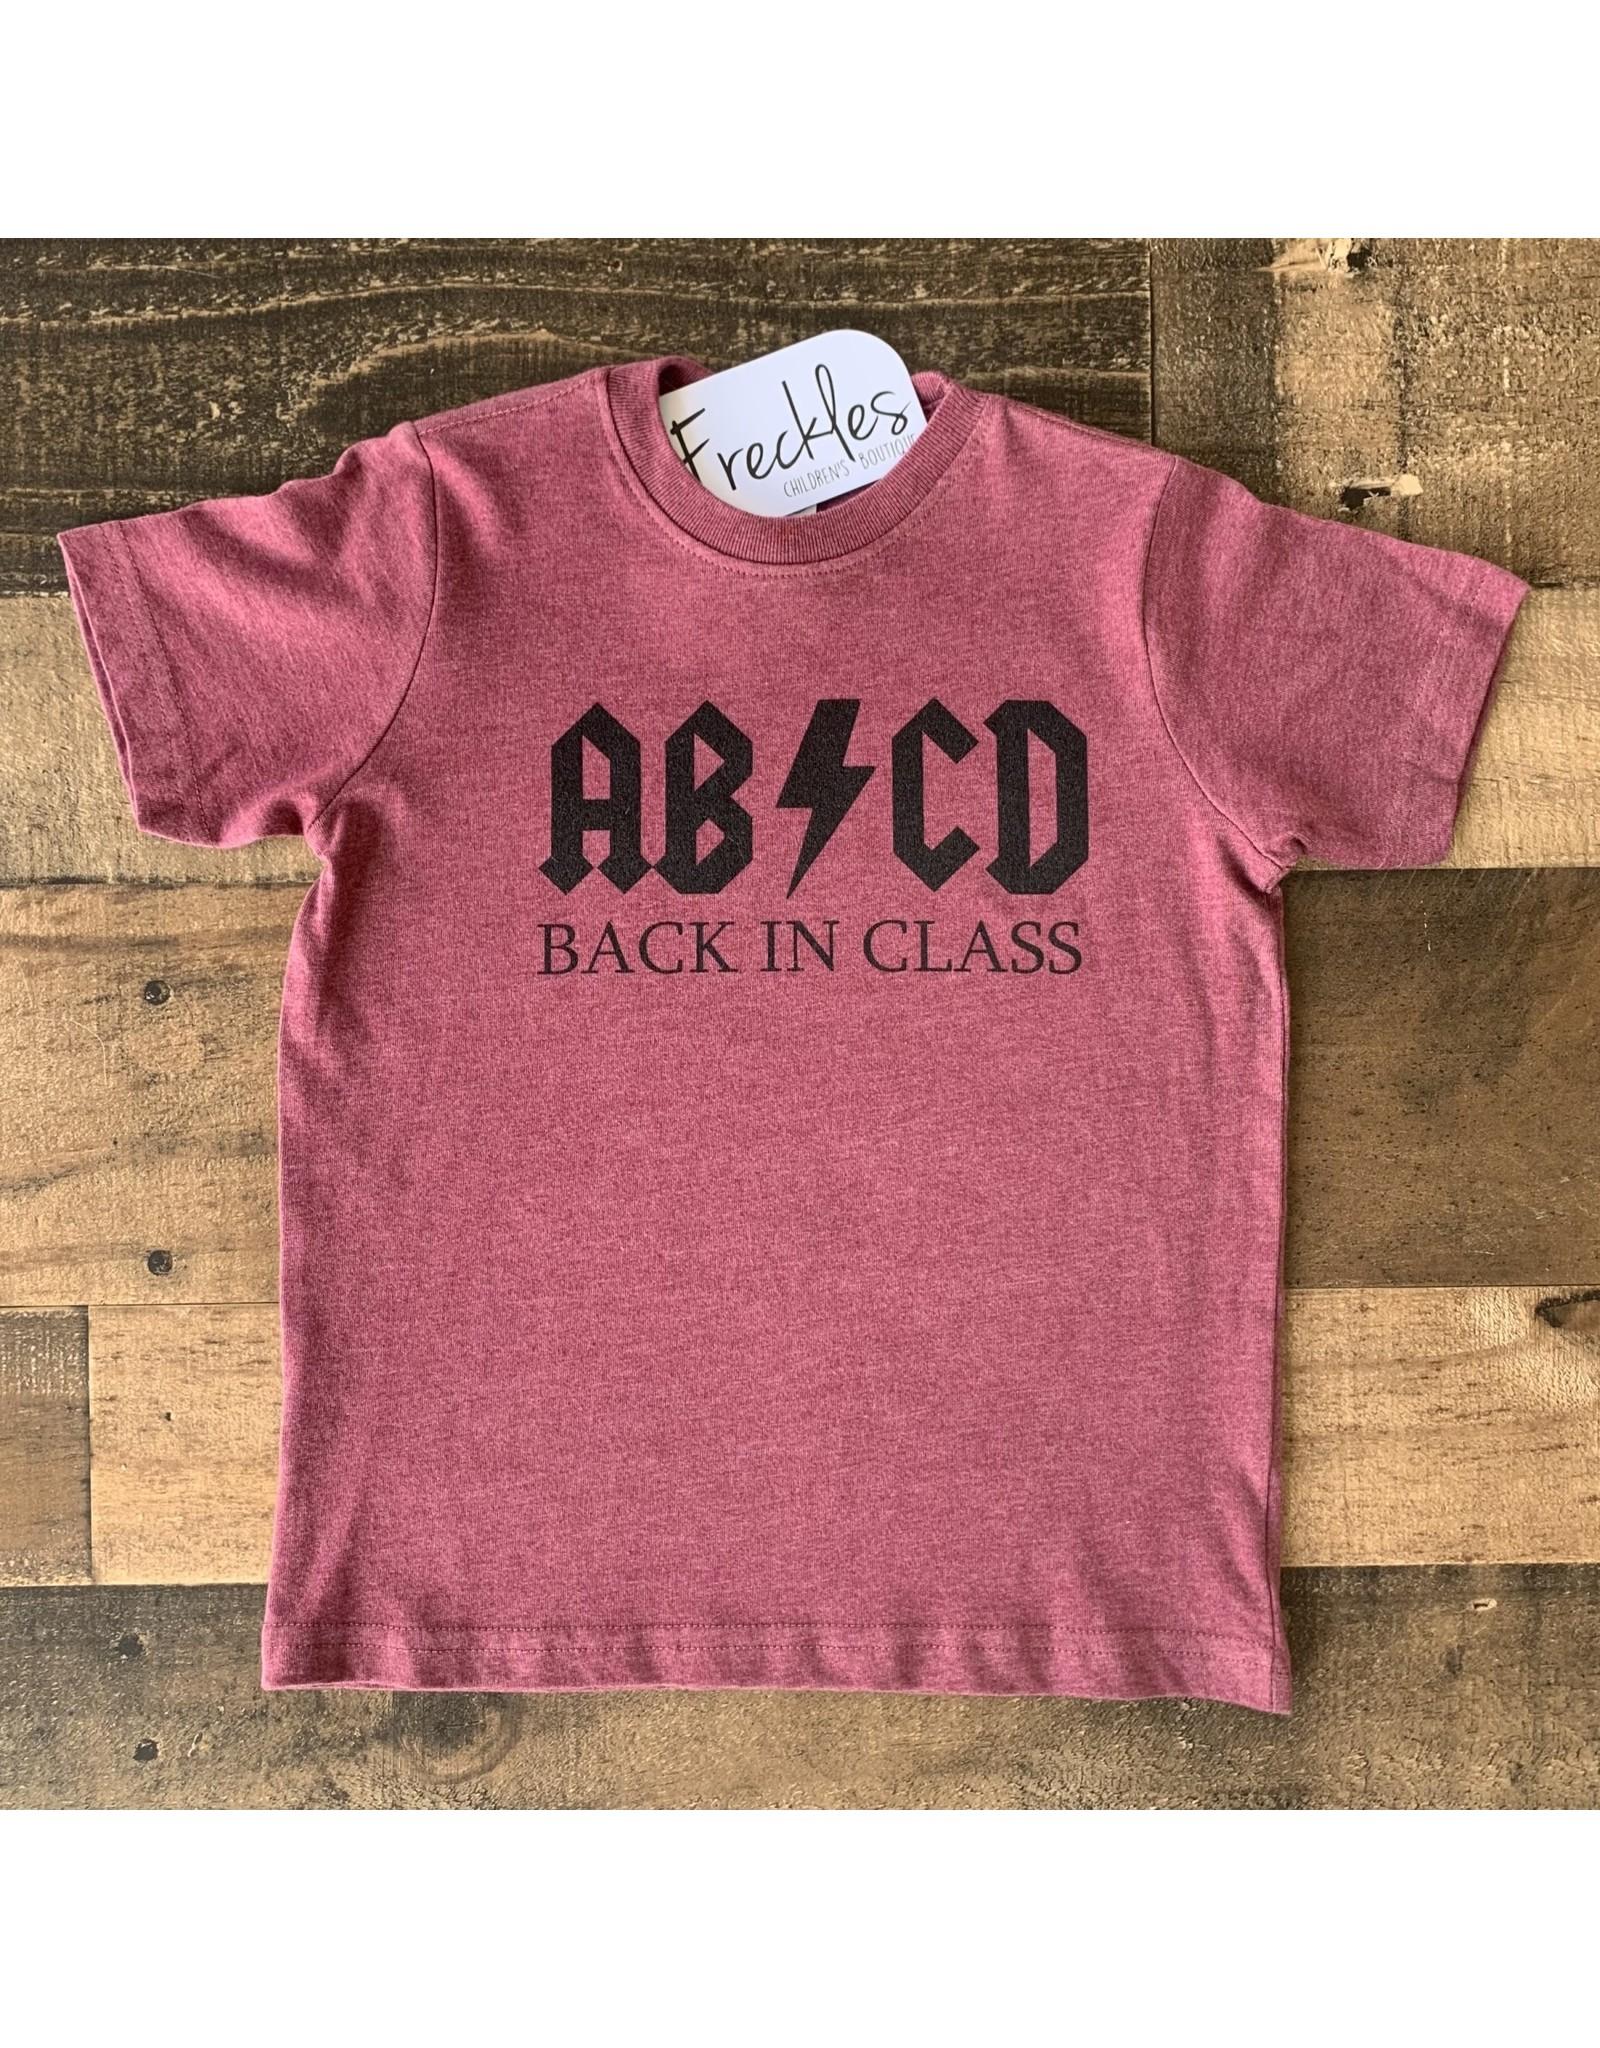 ABCD Back in Class TShirt: Burgundy